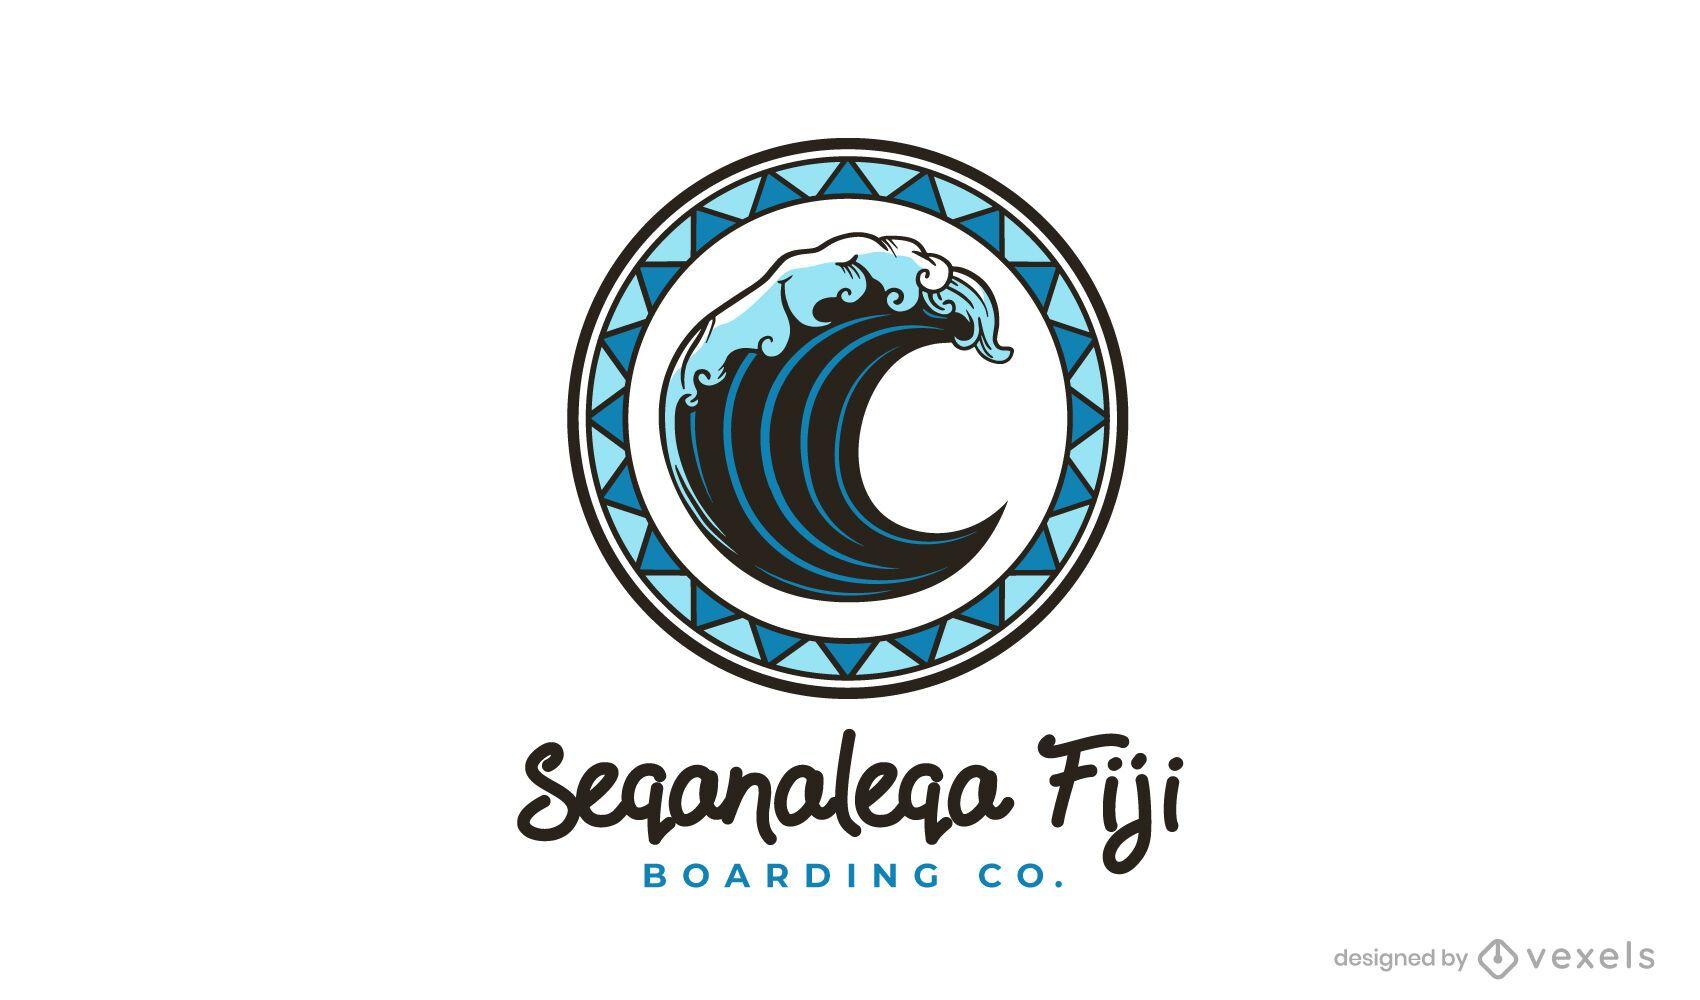 REQUEST Seqanaleqa fiji logo template